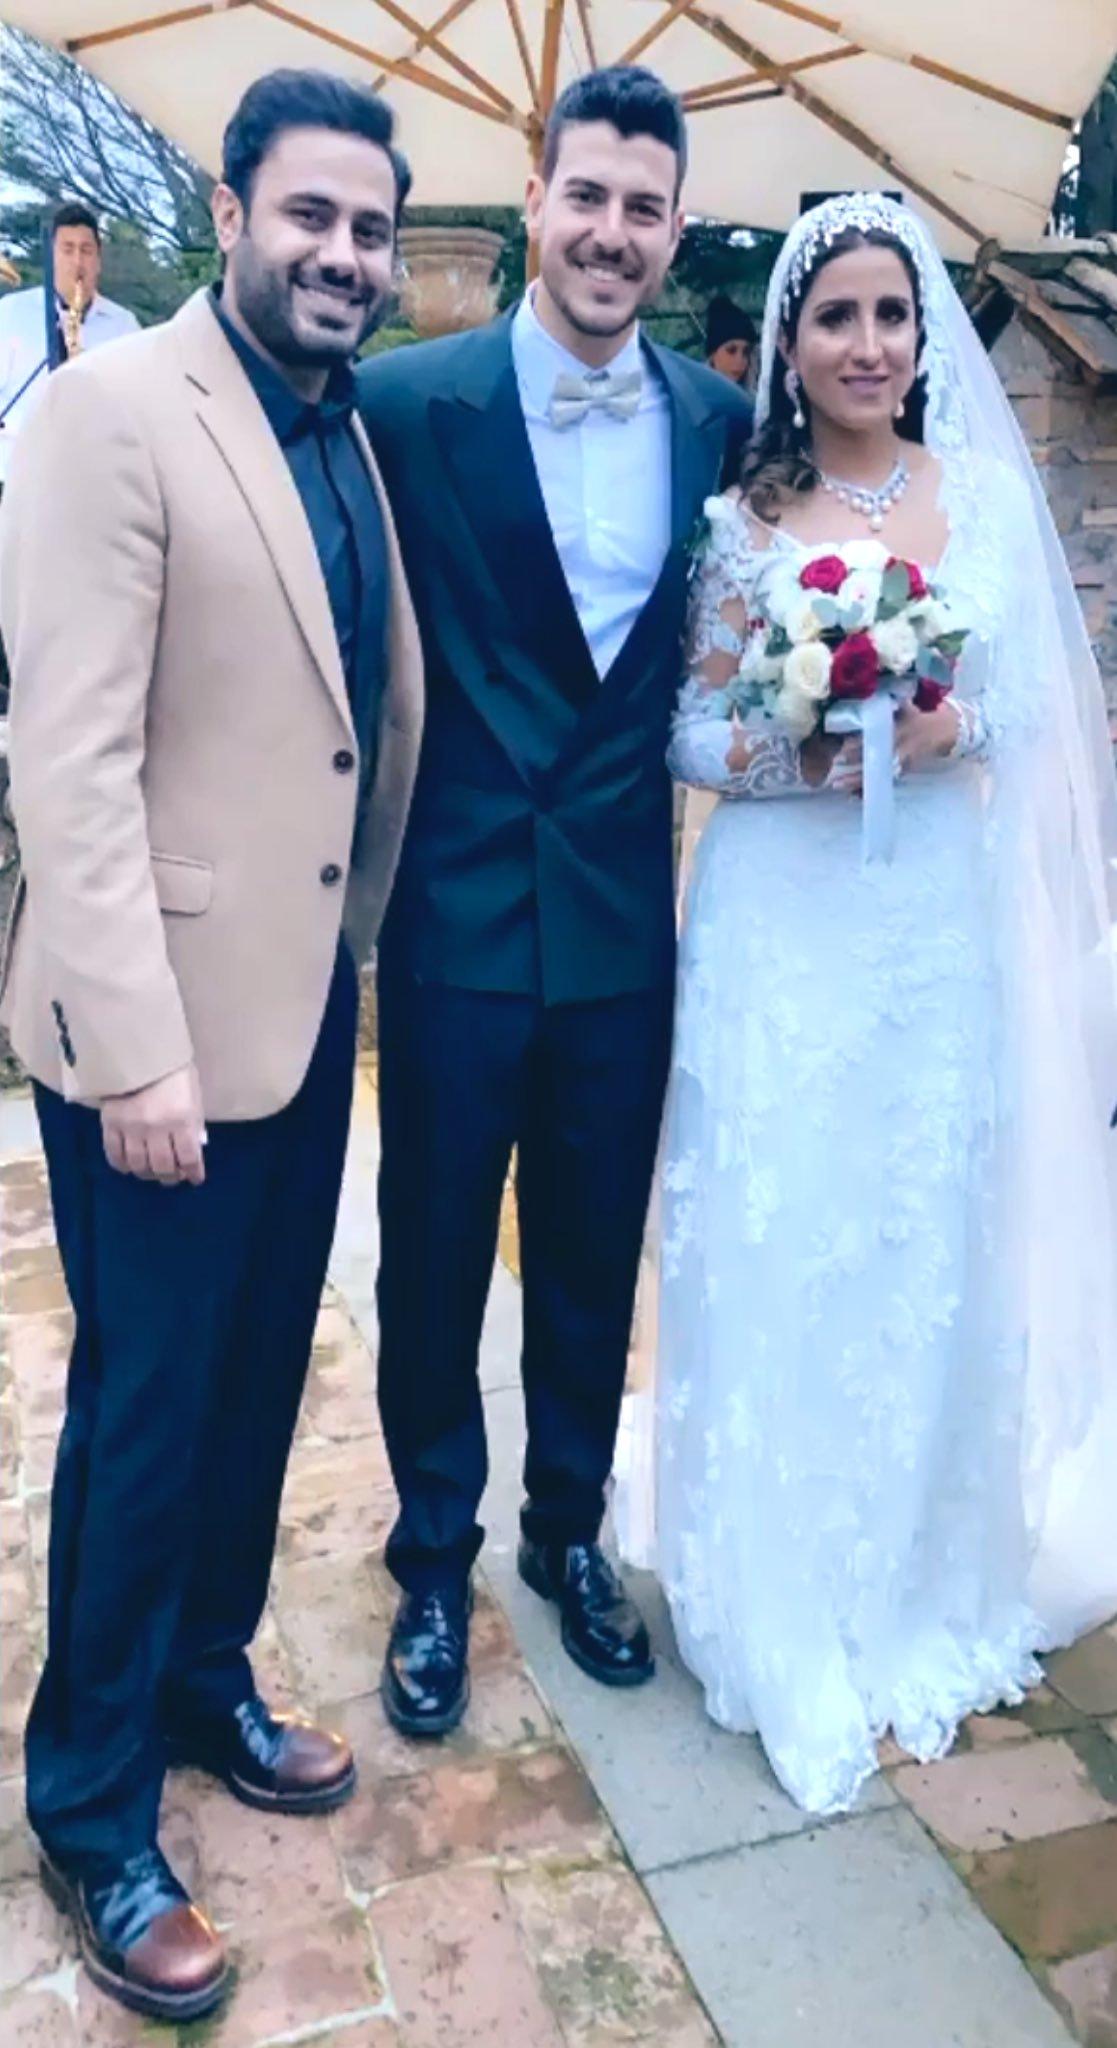 العروسان مع عبدالله بوشهري